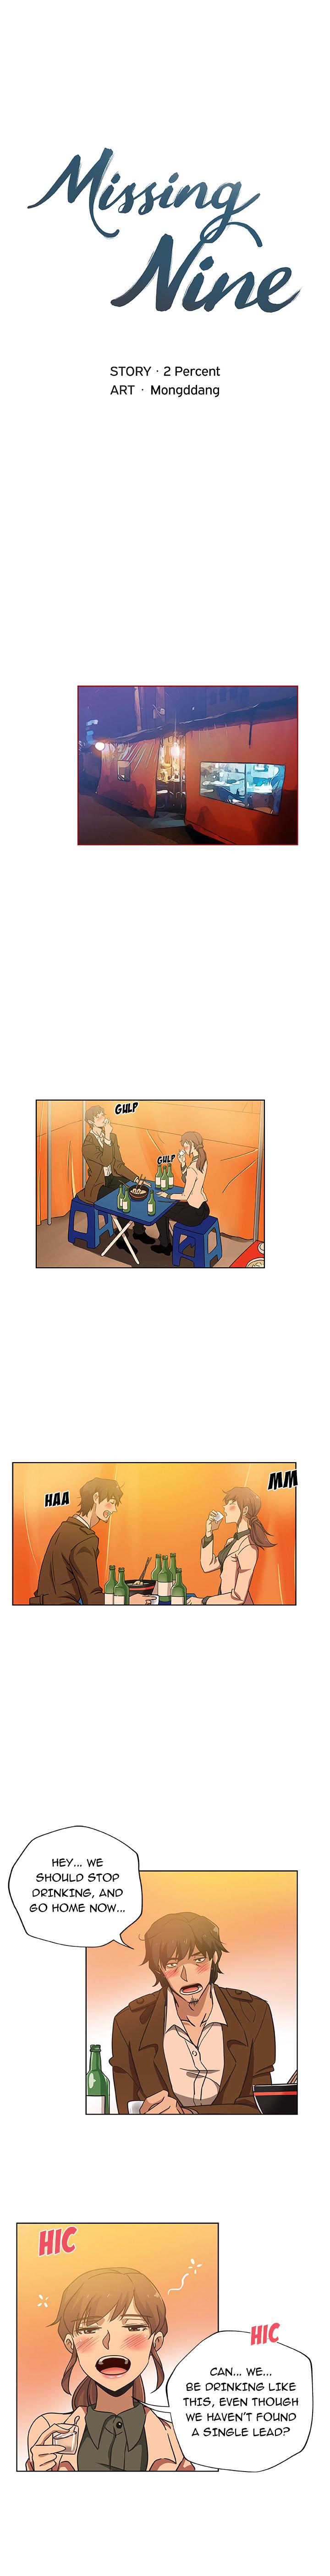 https://img2.nineanime.com/comics/pic2/42/27754/729006/0474c6ce8138165a852eccbe02d1404a.jpg Page 1